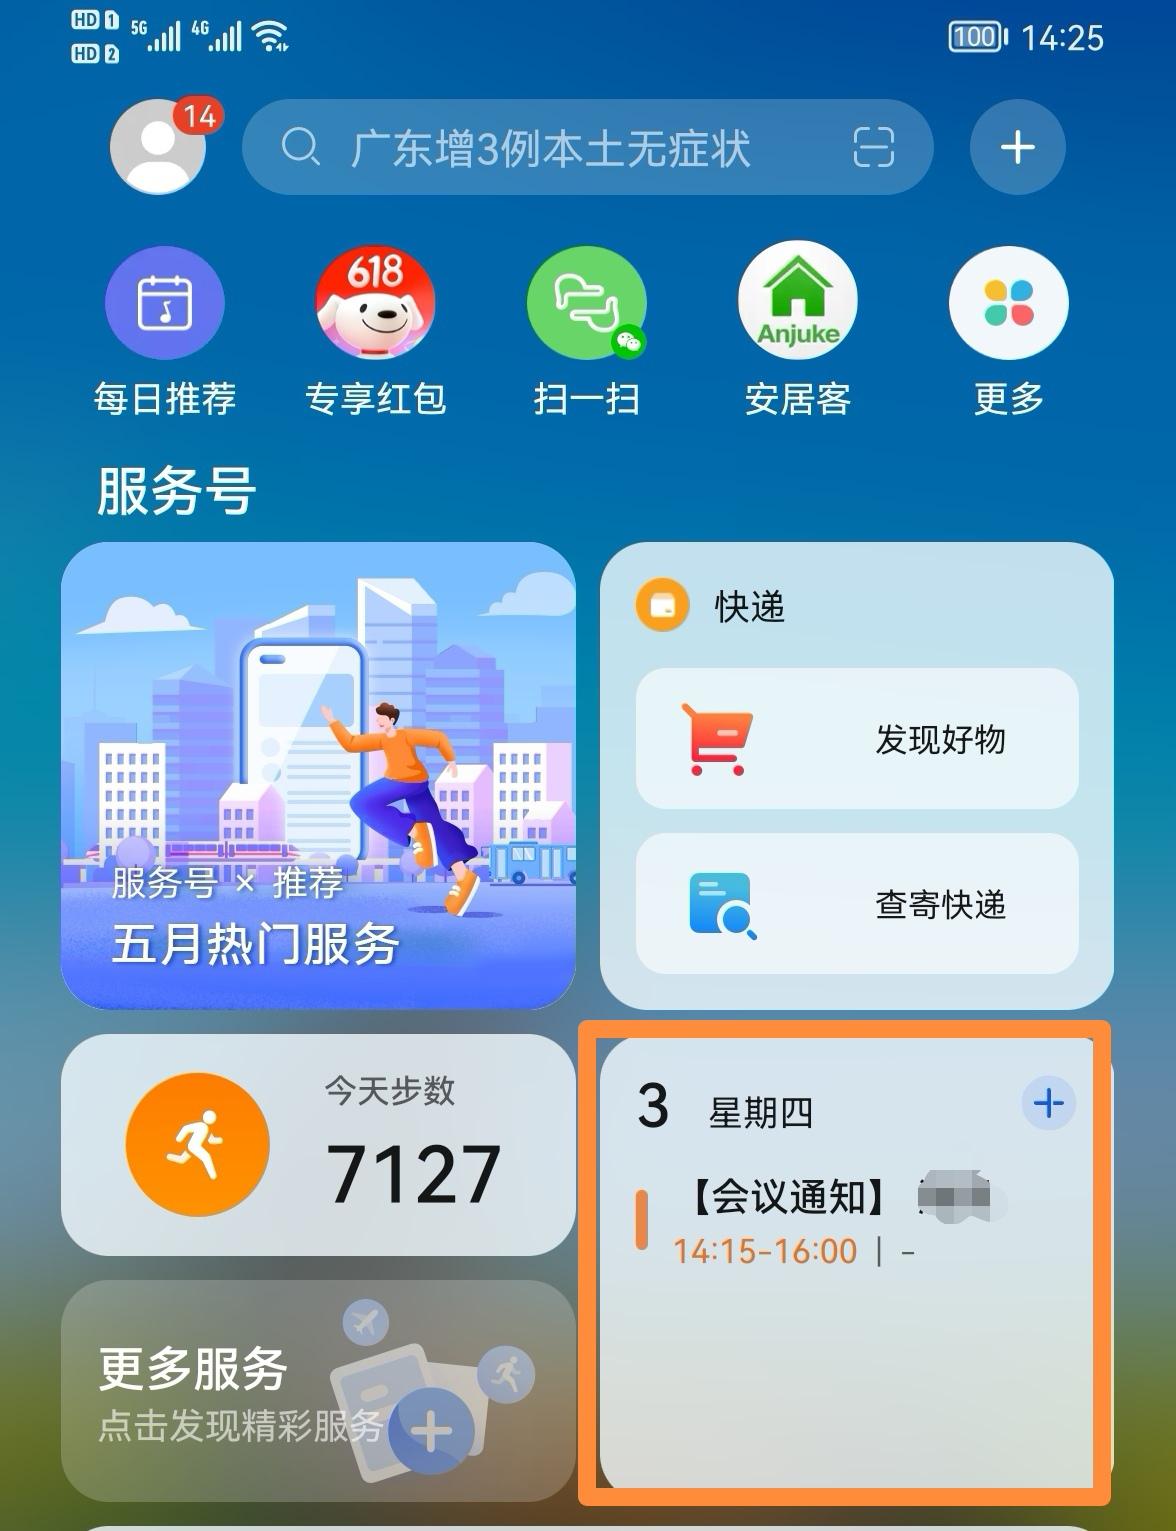 Screenshot_20210603_142547_com.huawei.android.launcher_edit_16364192375627.jpg